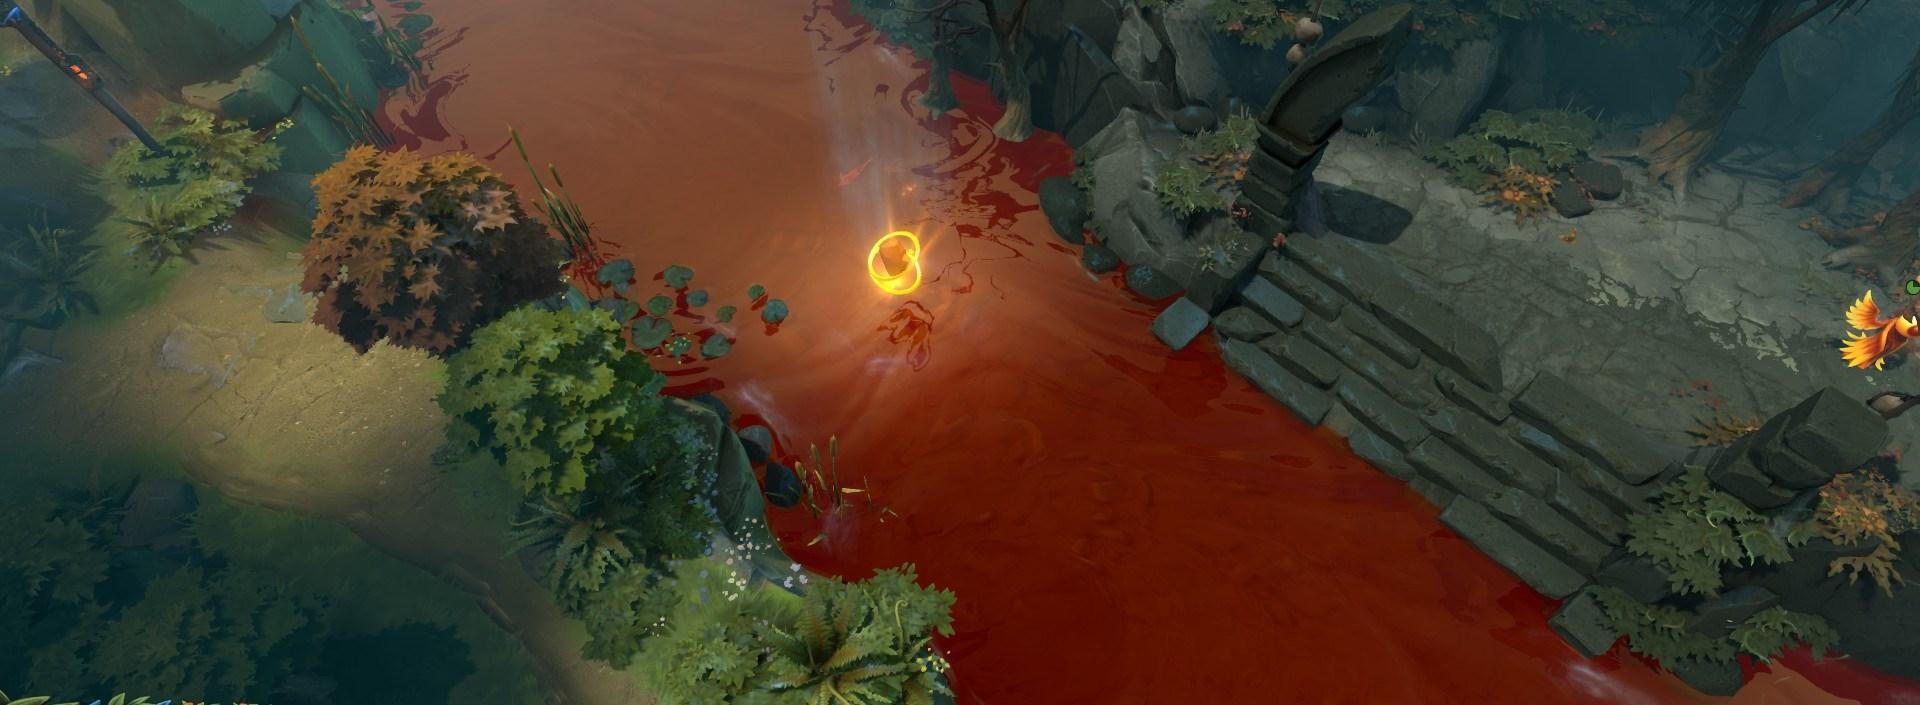 River Vial Blood Preview B1.jpg